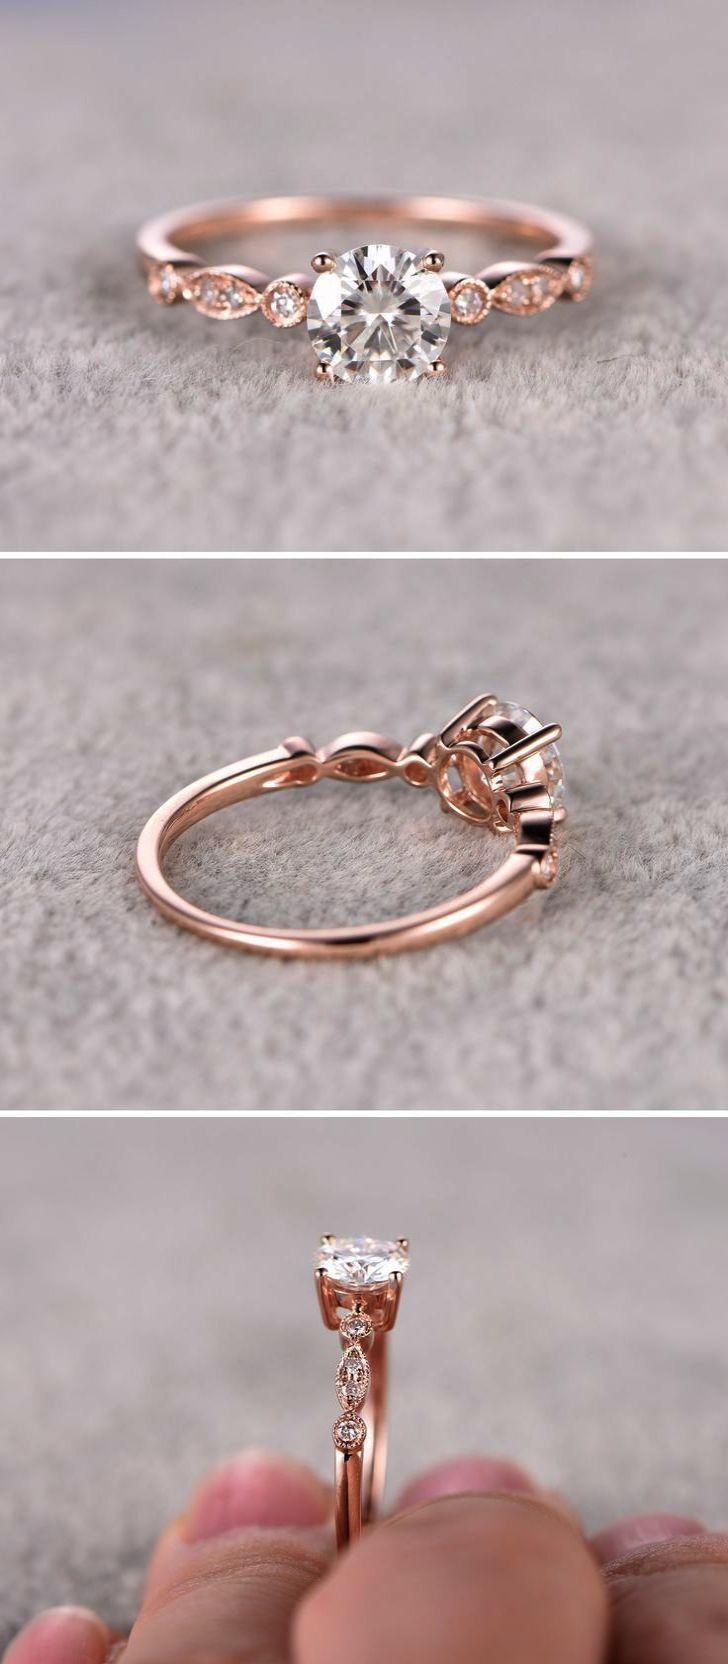 Great ue wedding rings for men xx goldringformen jewelry in